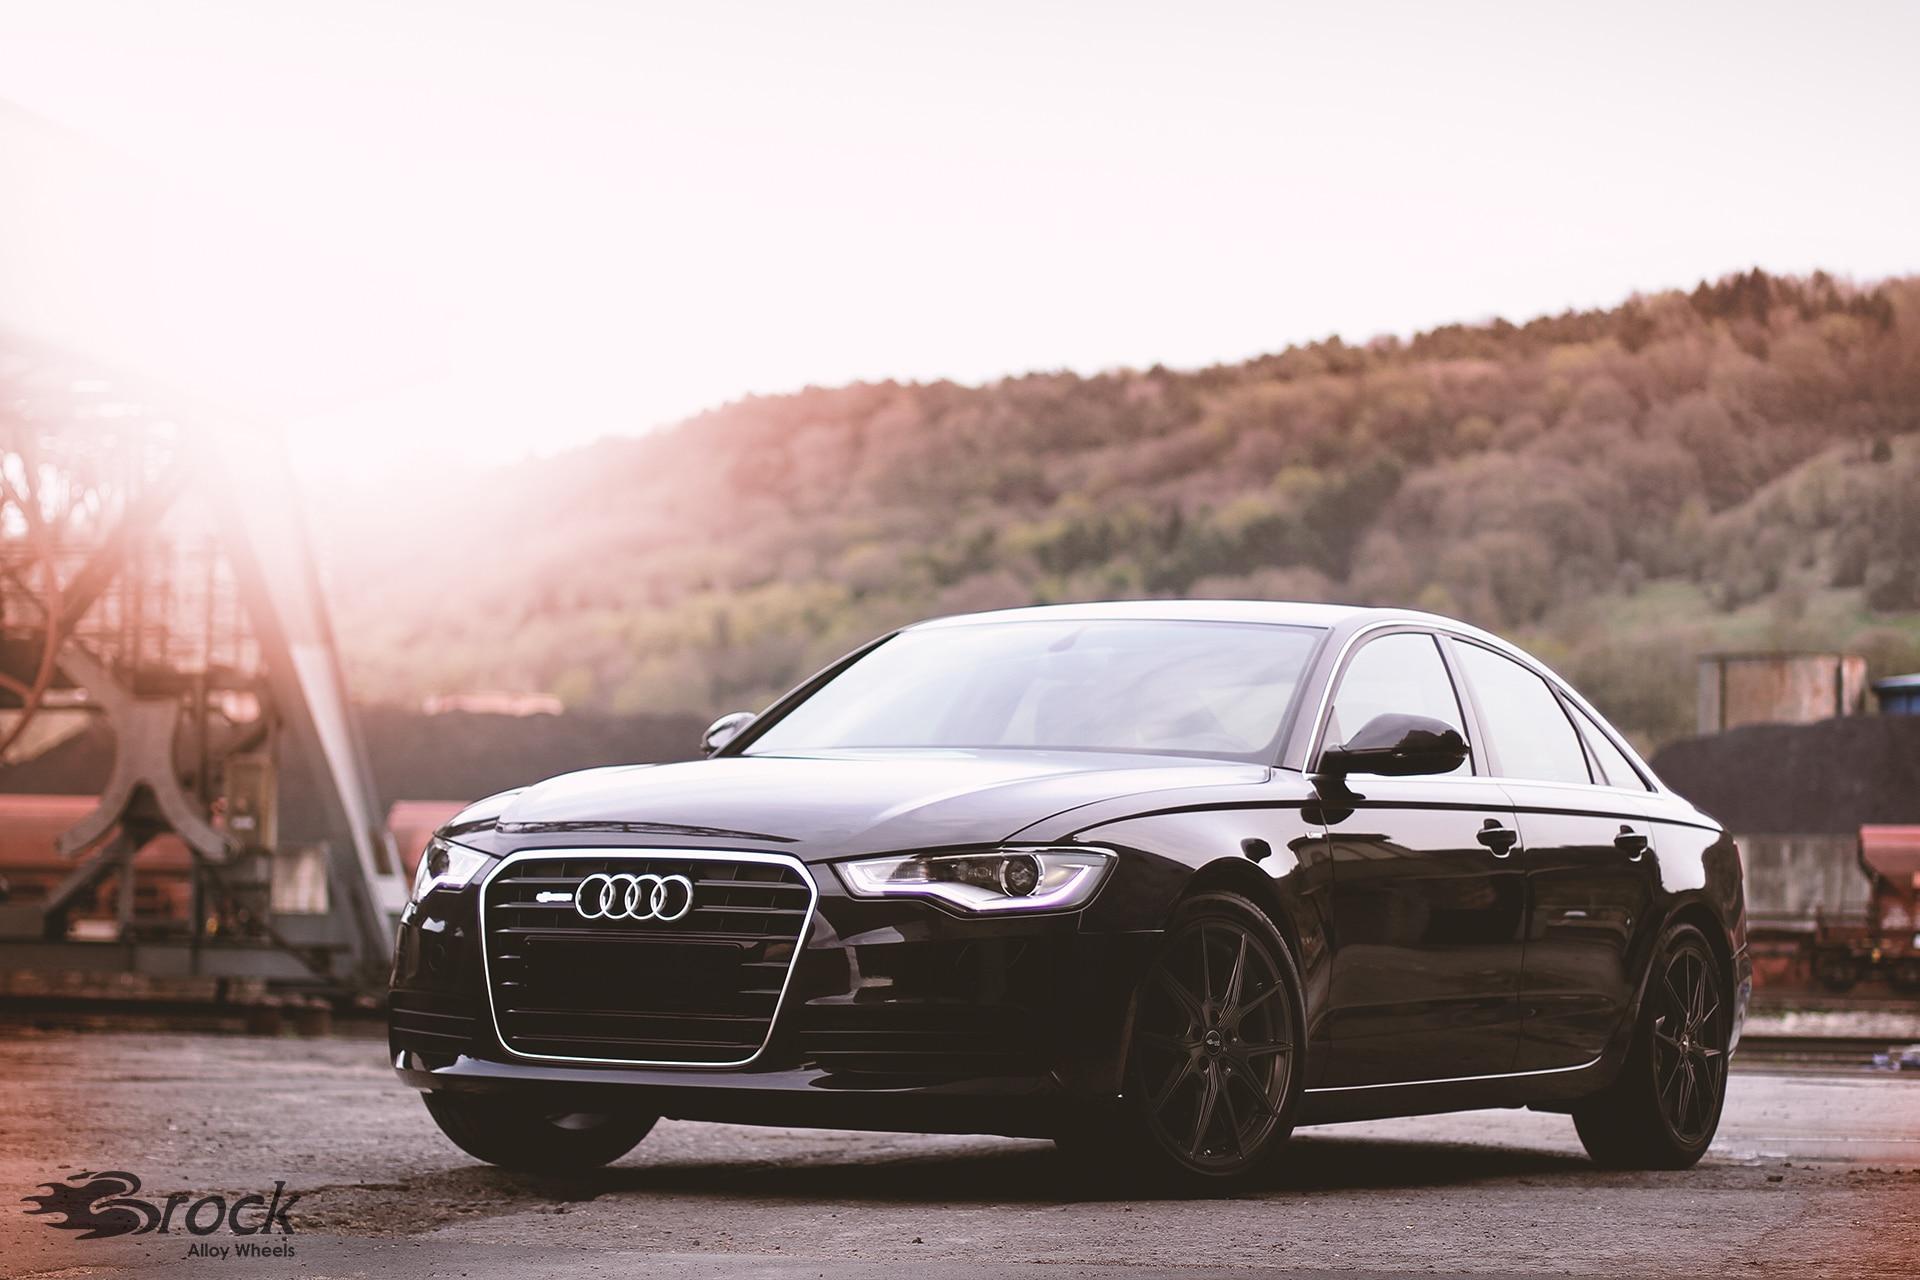 Audi A6 Brock B40 SBM